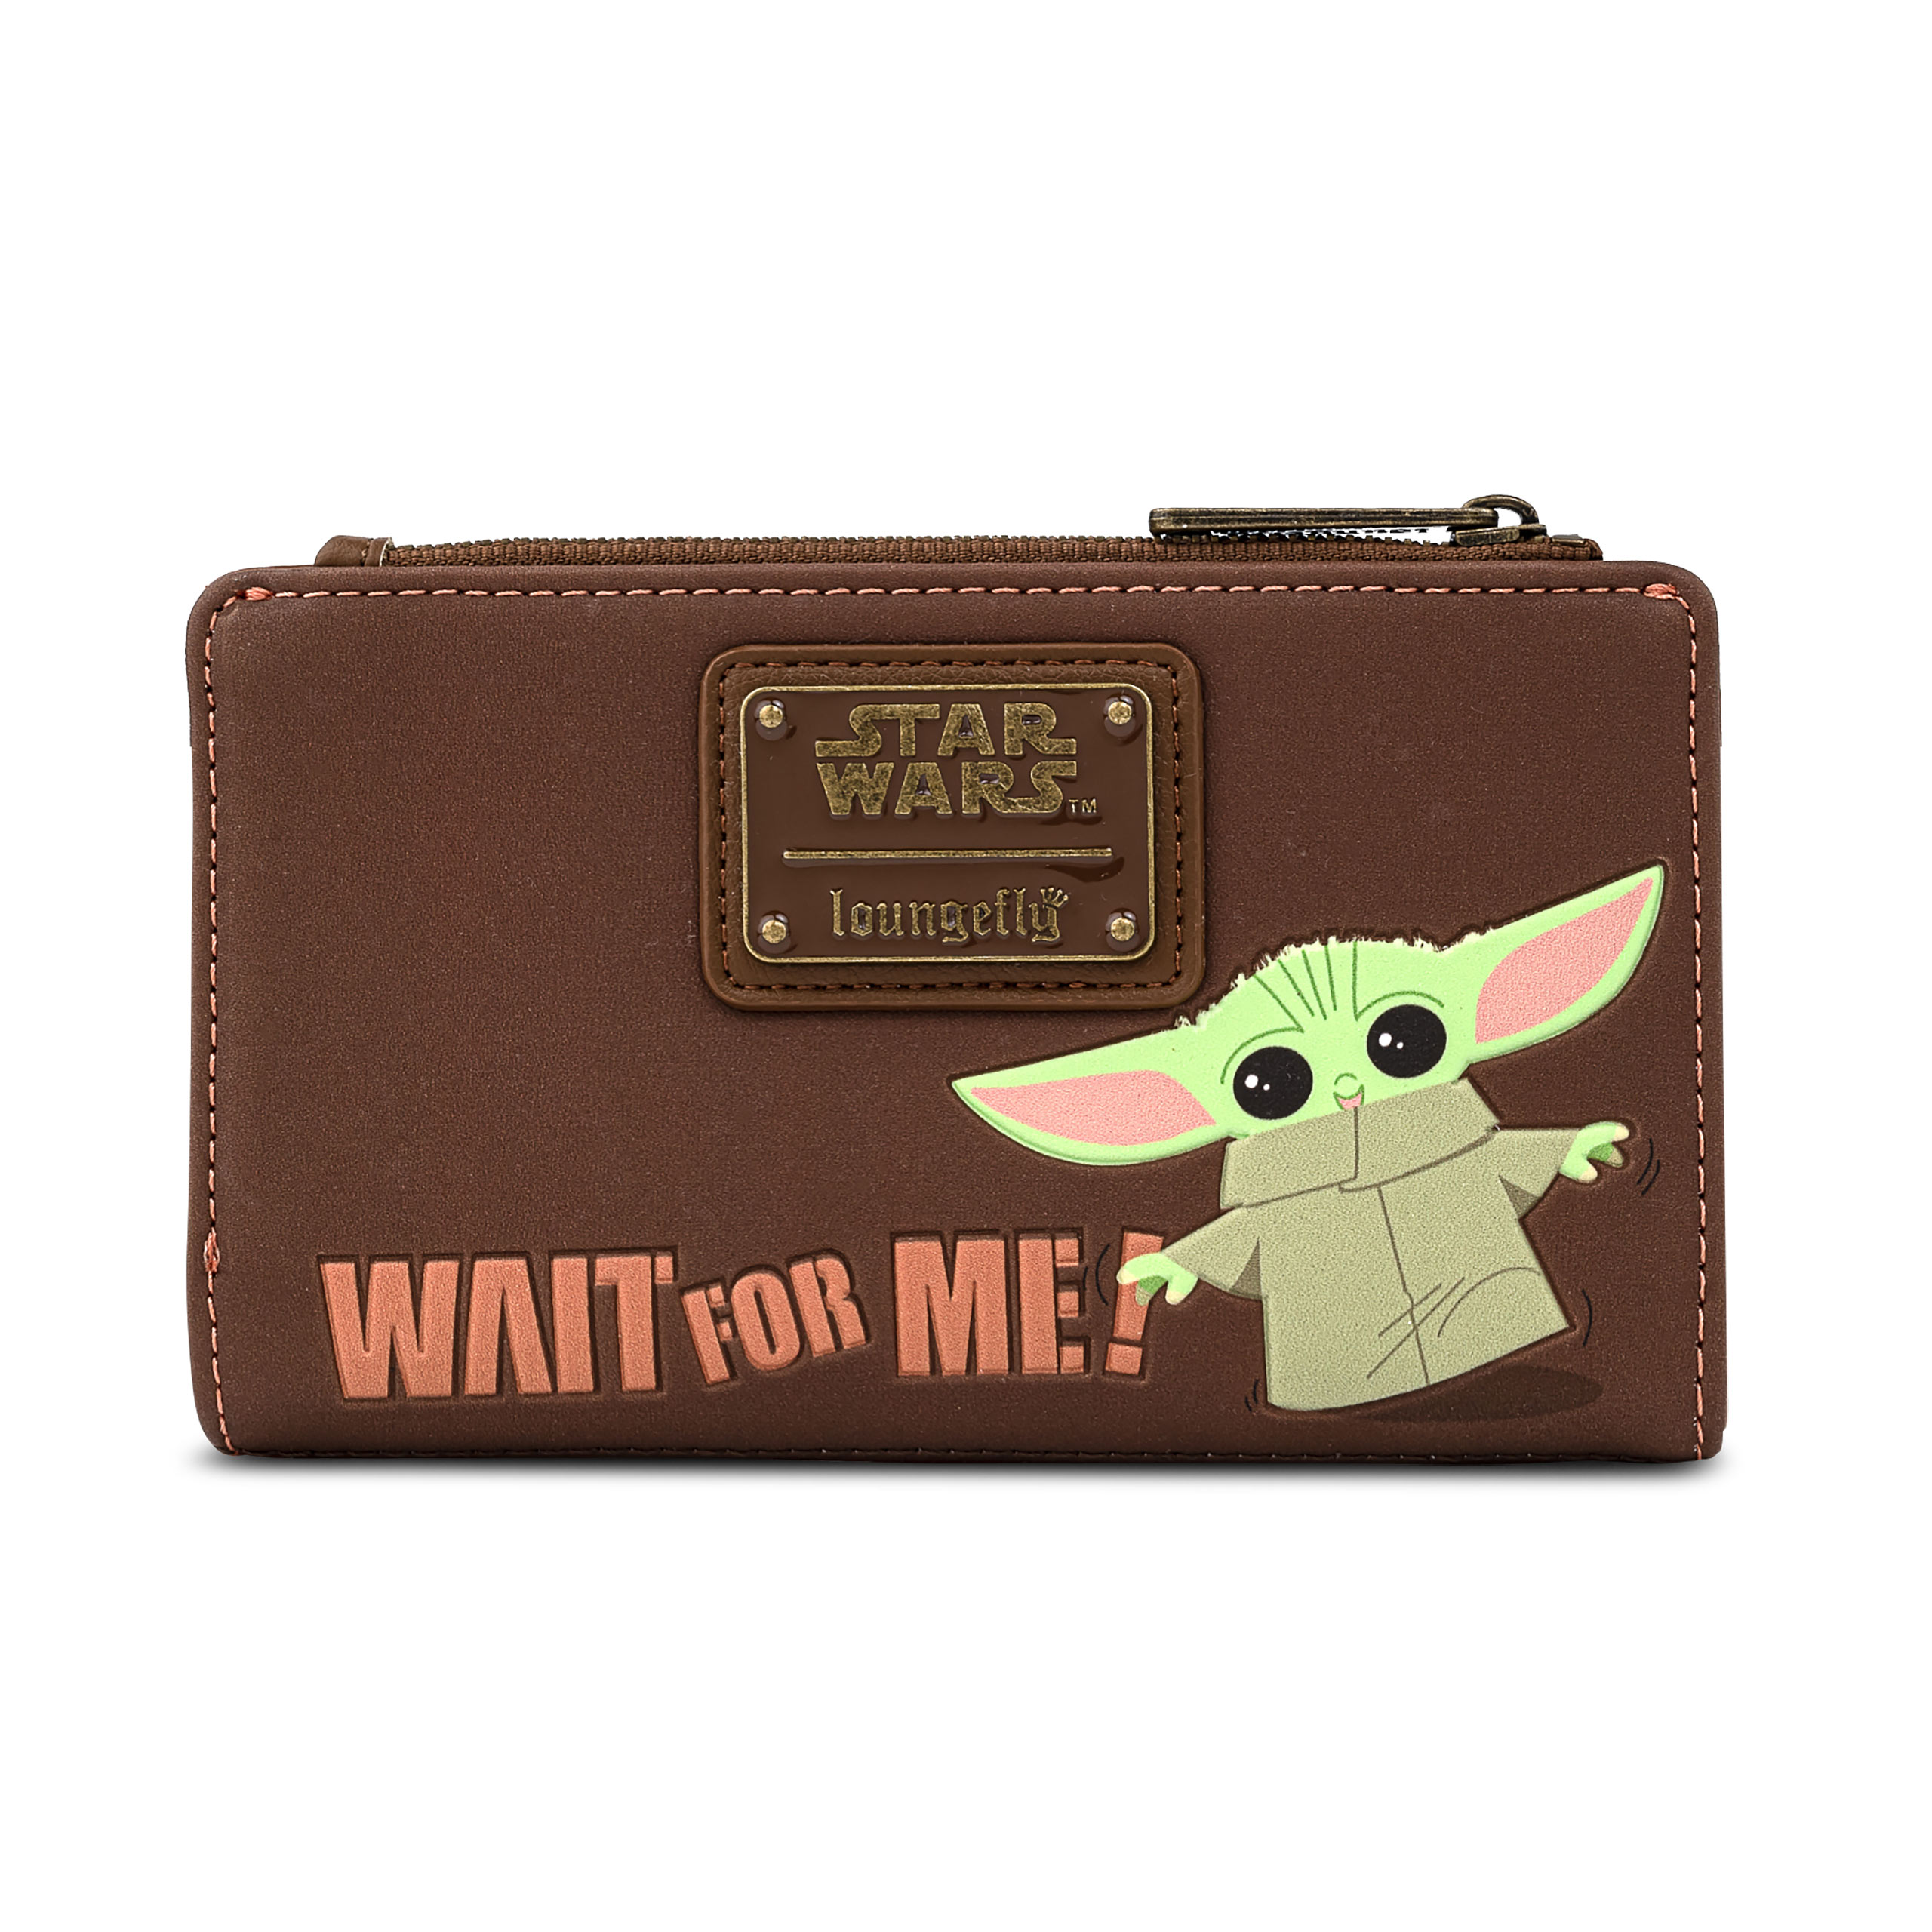 Grogu Wait For Me Geldbörse - Star Wars The Mandalorian